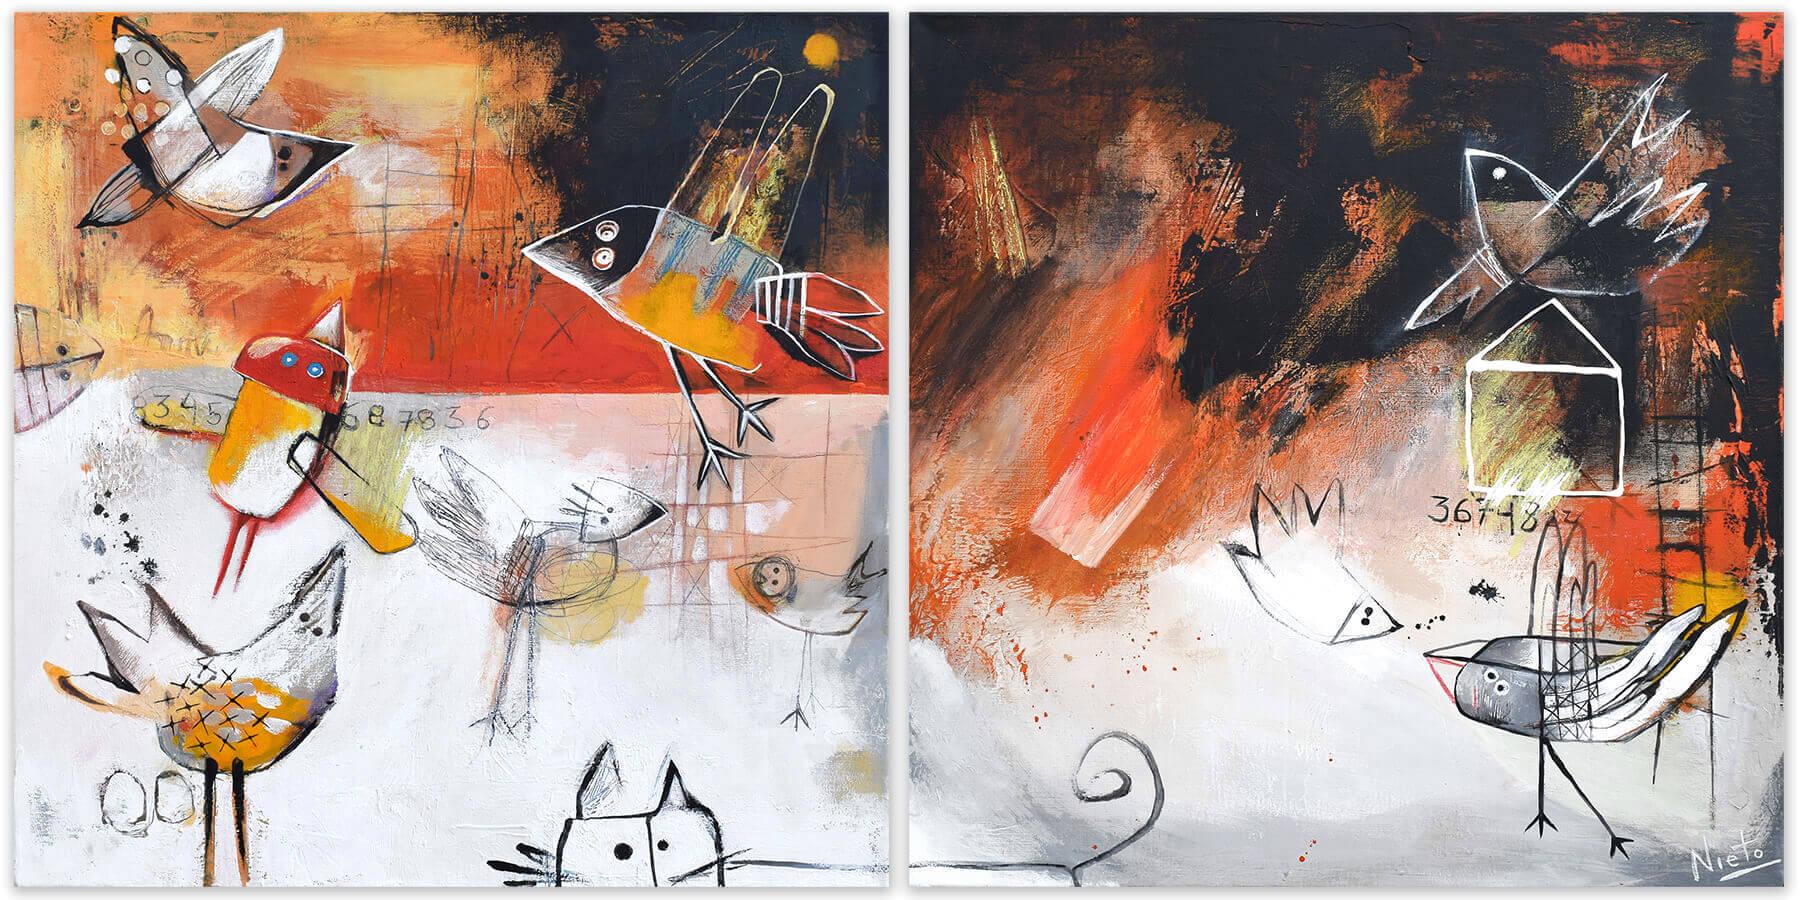 Paísaje de vuelos - diptych - original painting on canvas by Angeles Nieto